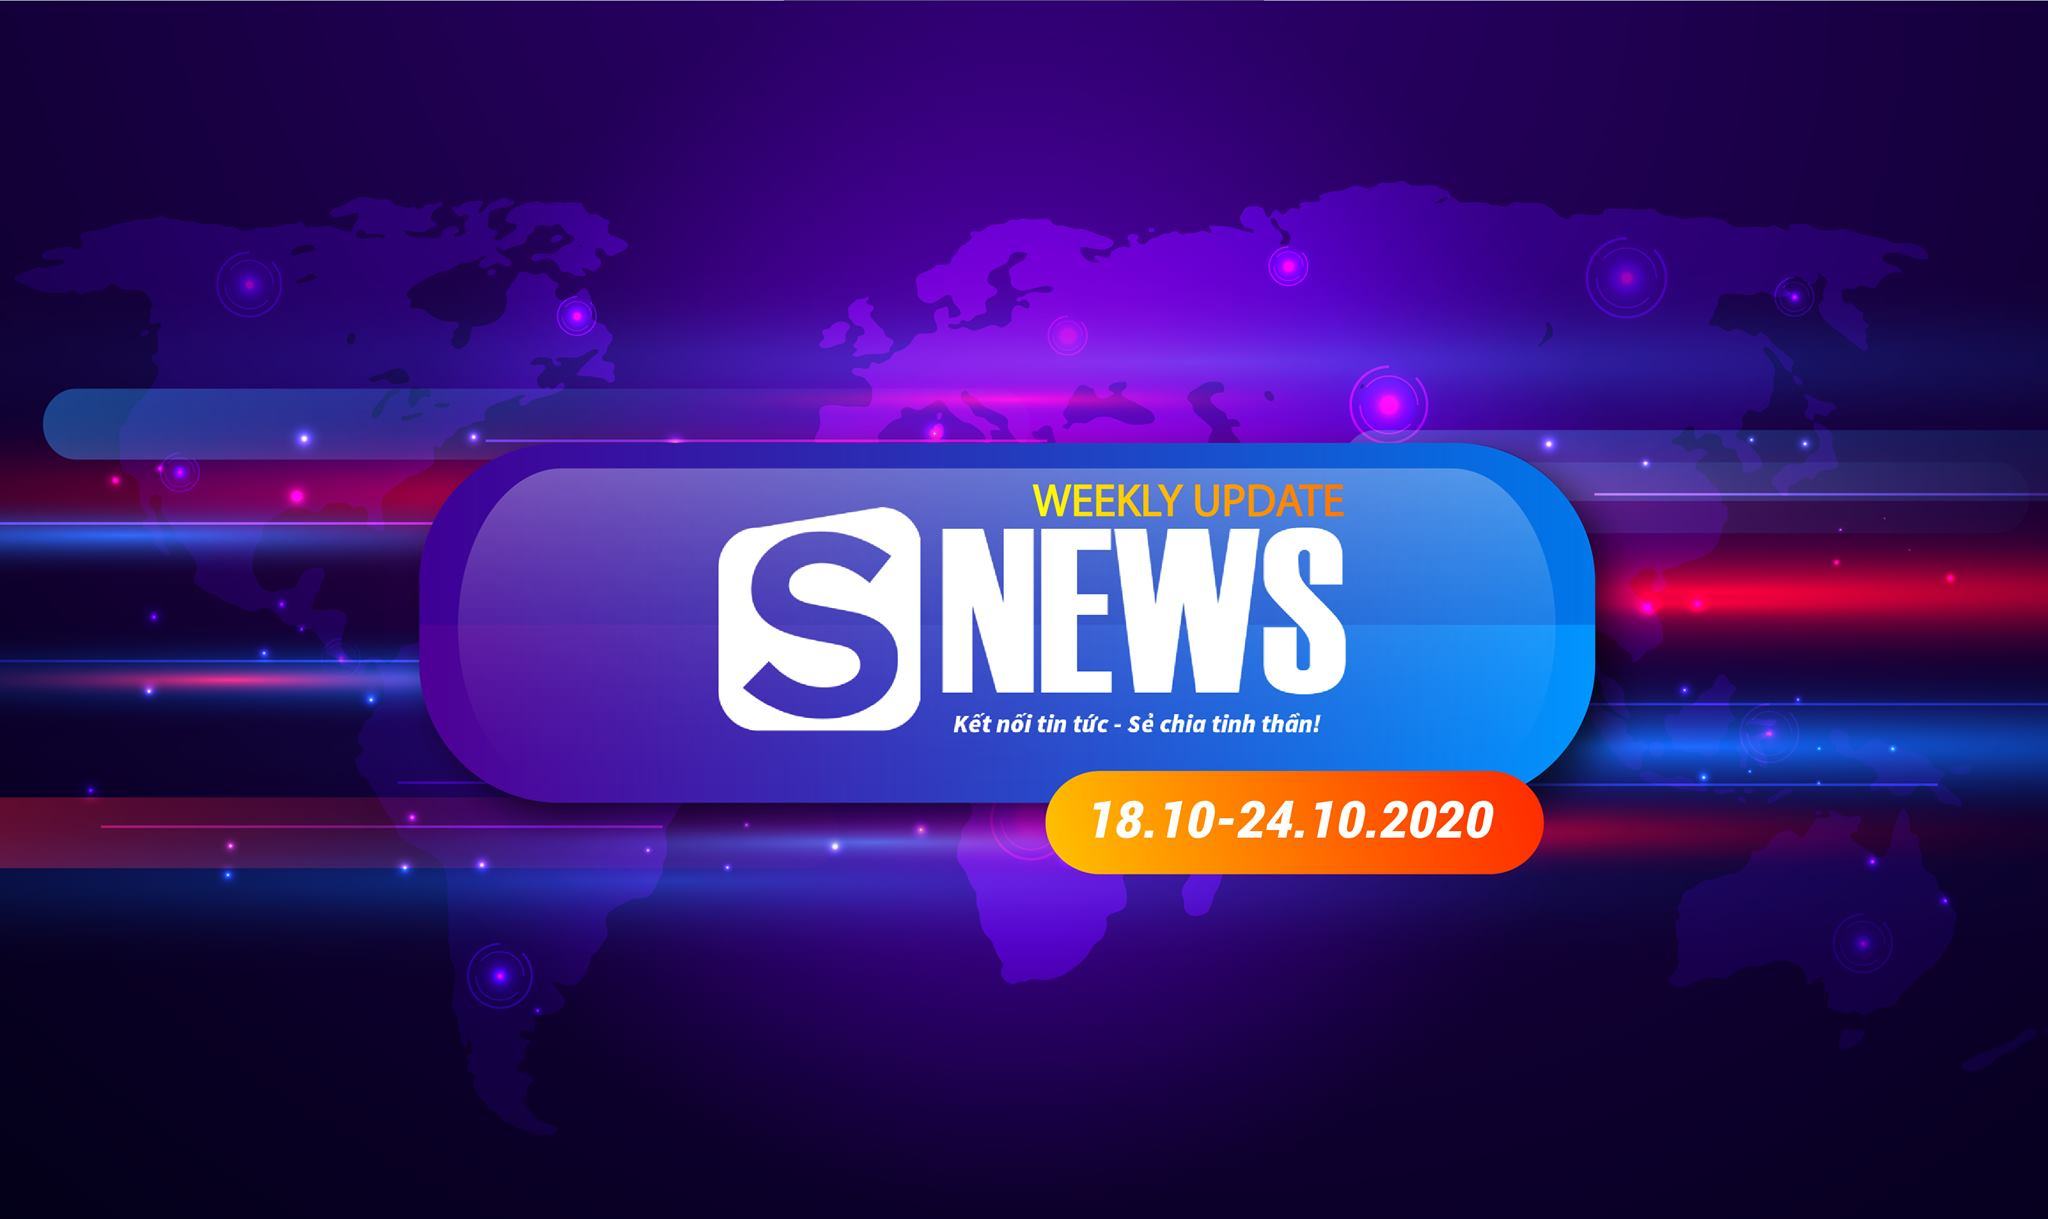 Tổng hợp tin tức Sapo tuần qua: 18.10 - 24.10